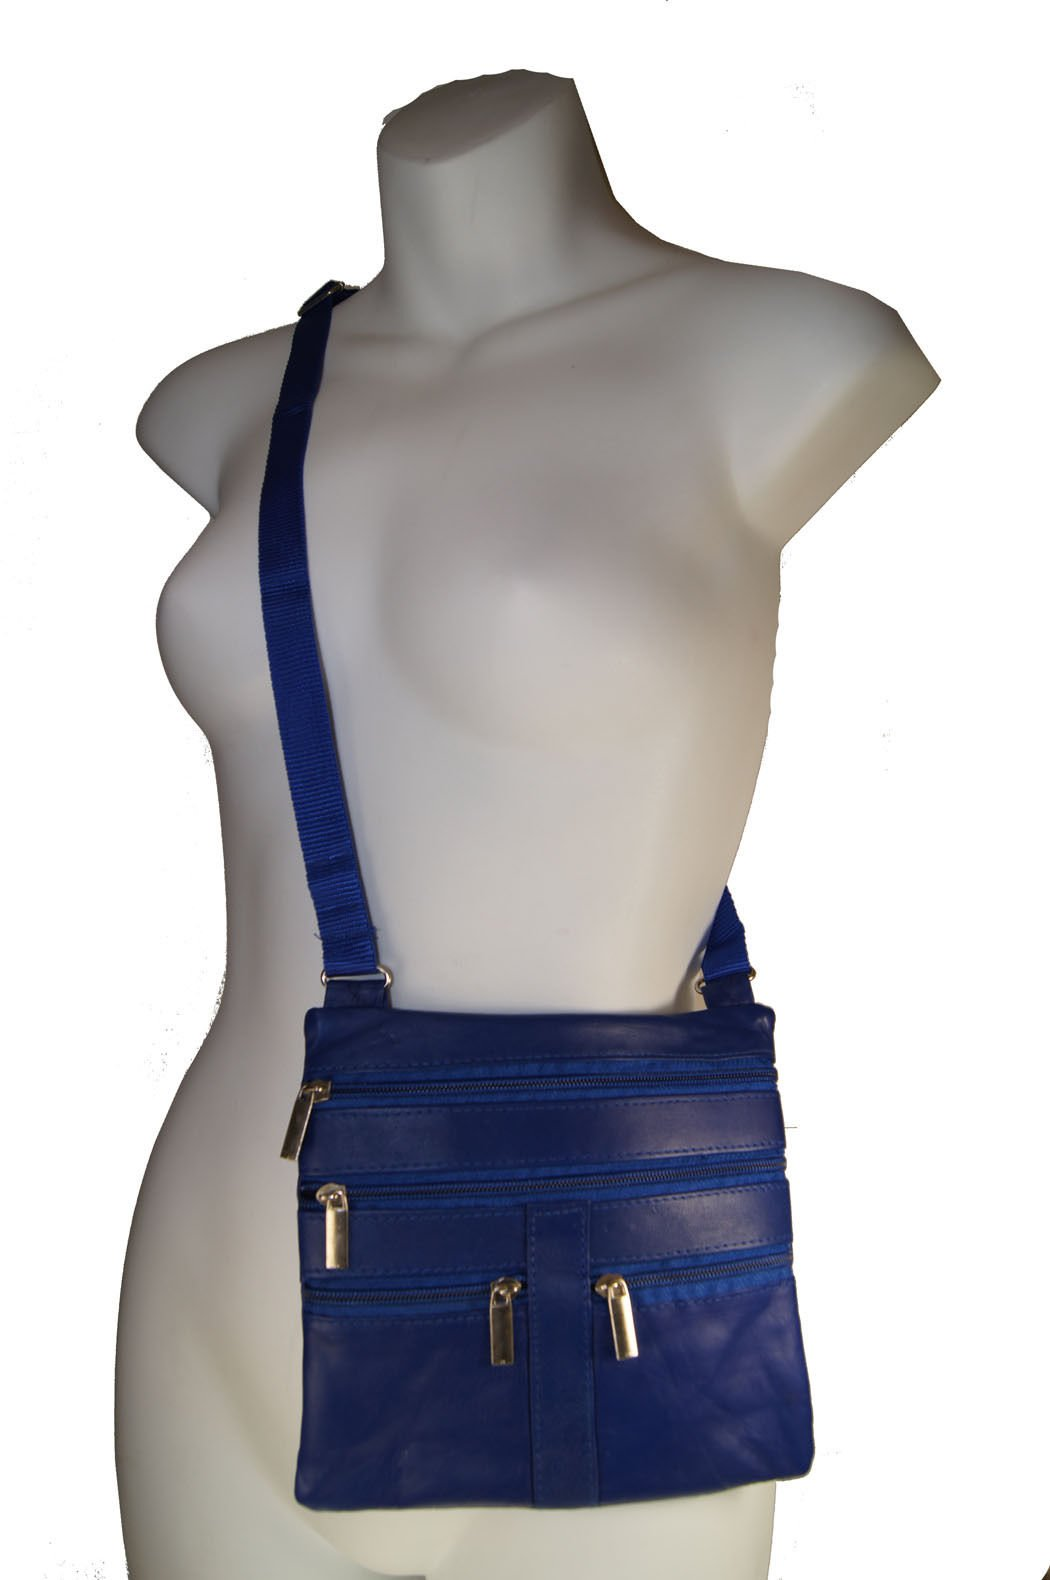 Royal Blue Ladies Genuine Leather Cross Body Bag Satchel Messenger Bag 48'' Strap